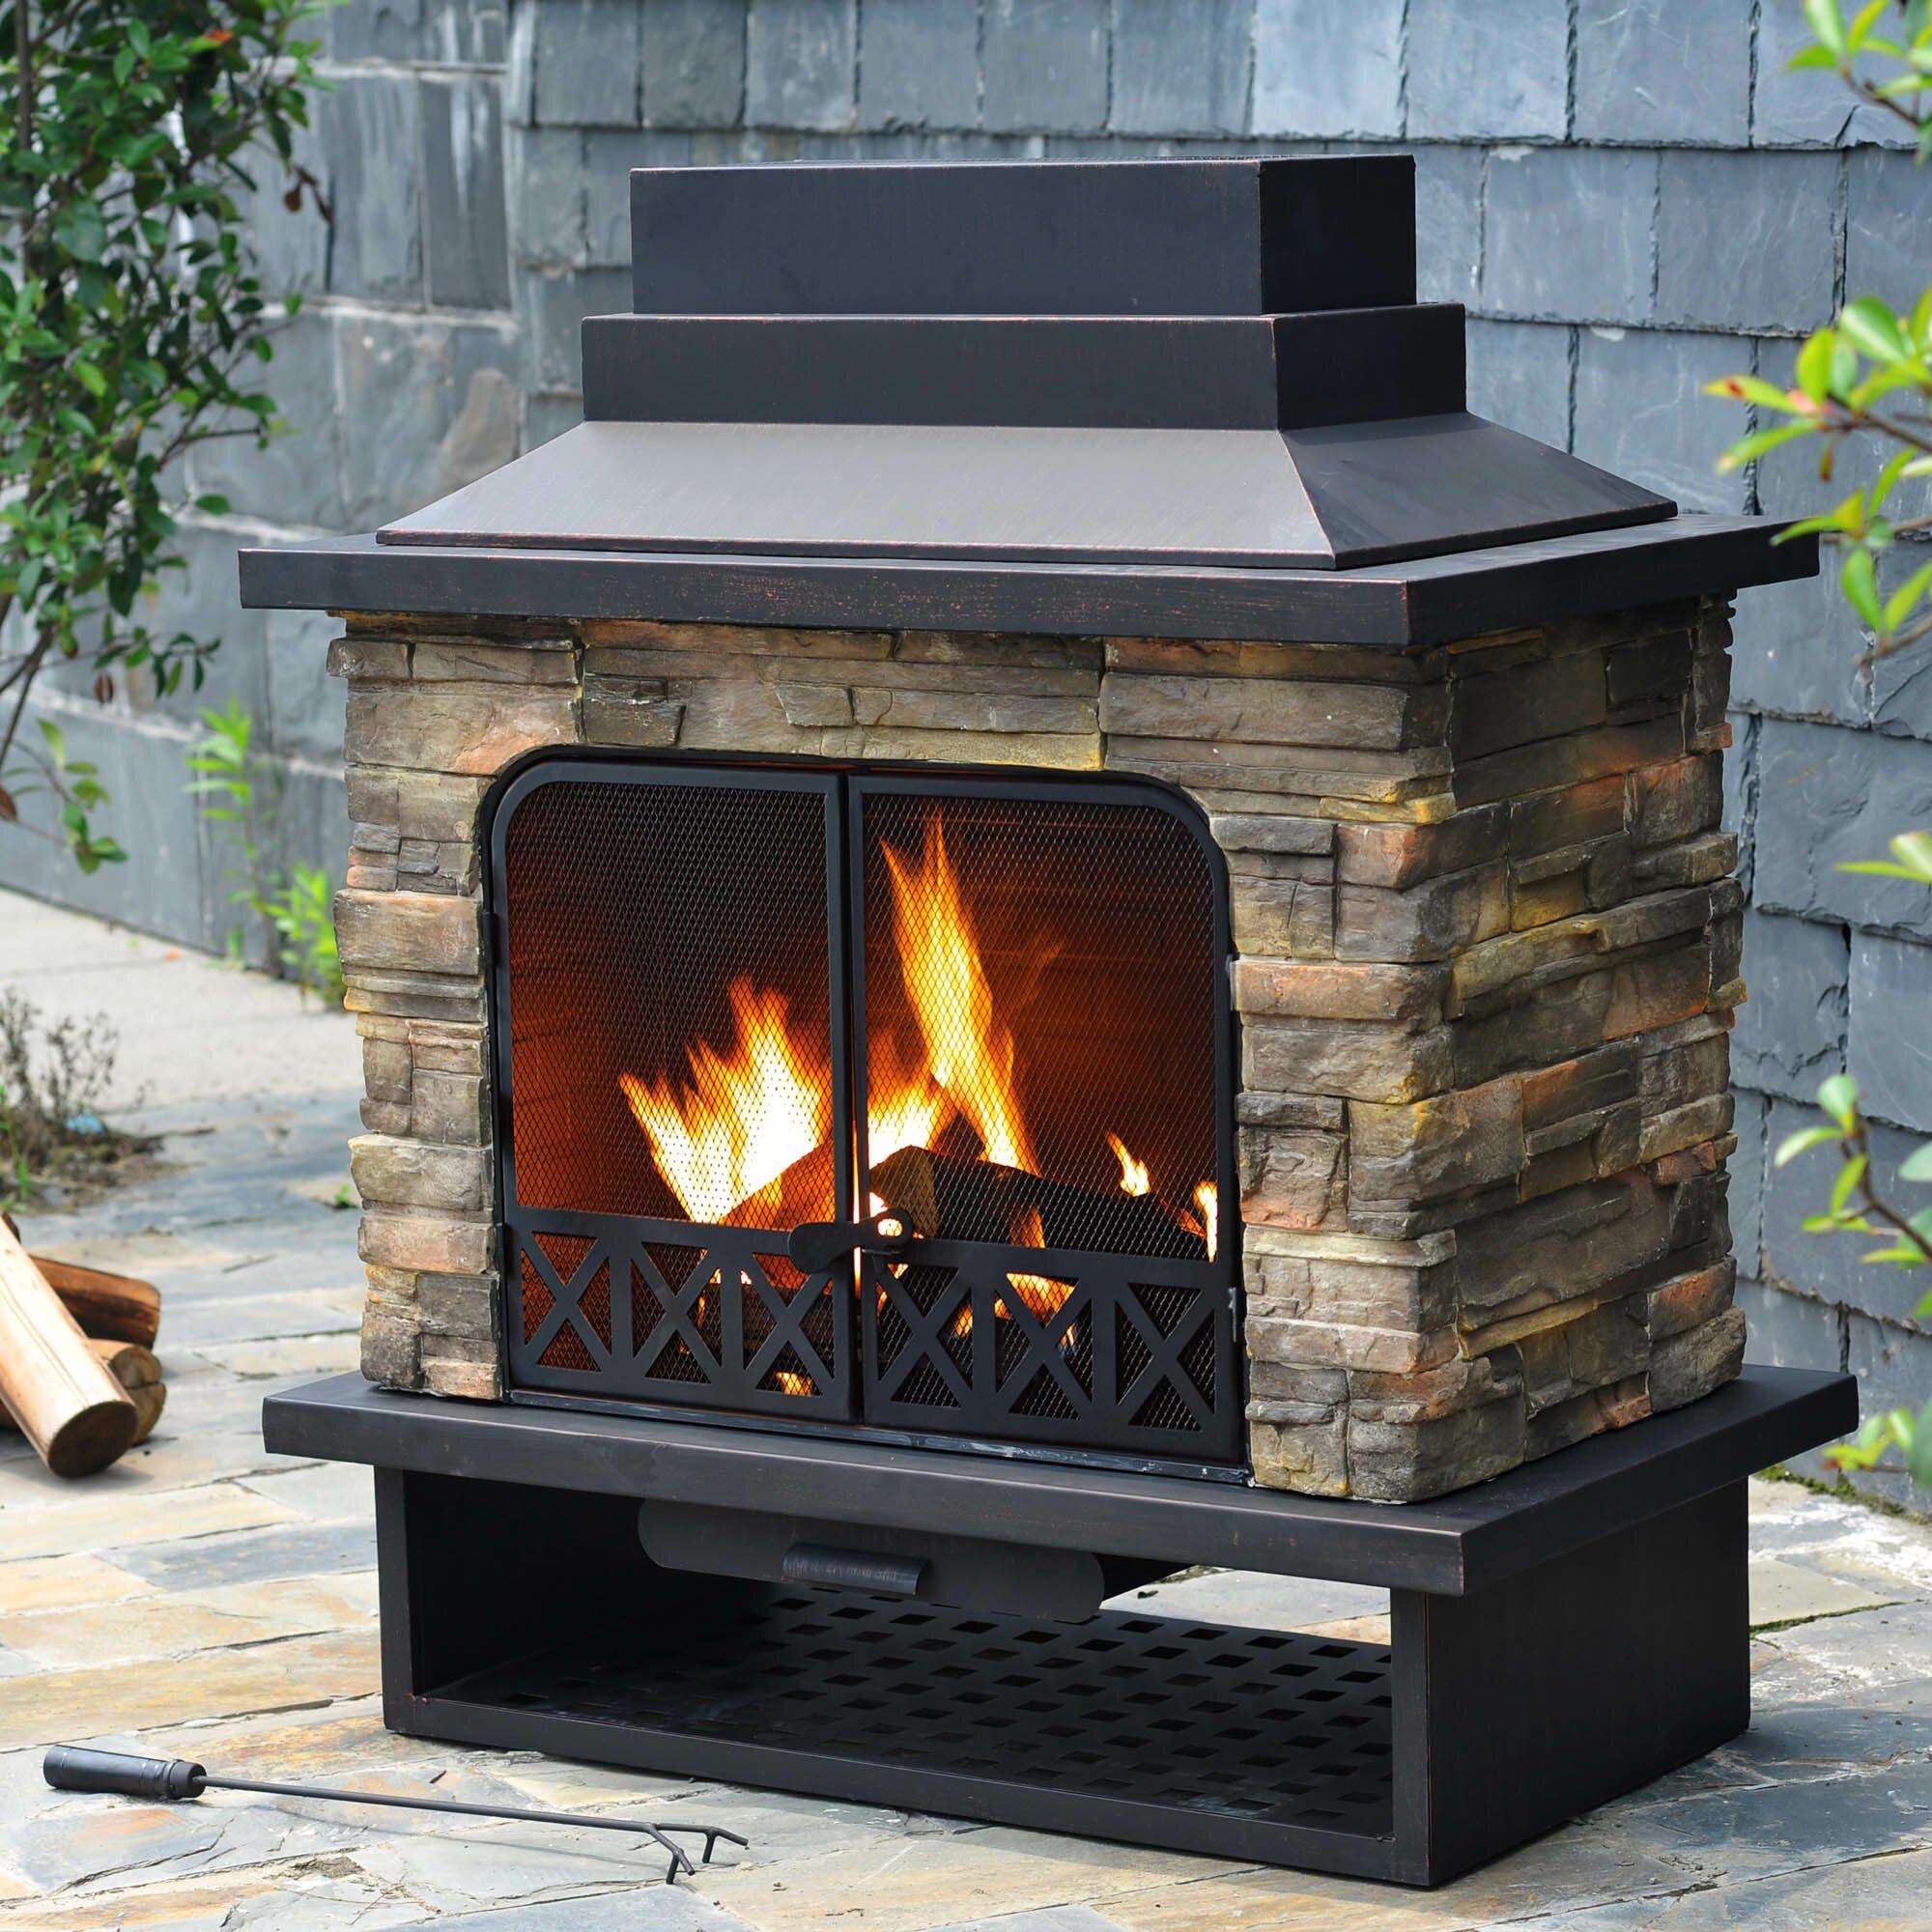 Sunjoy Felicia Steel Wood Outdoor Fireplace & Reviews